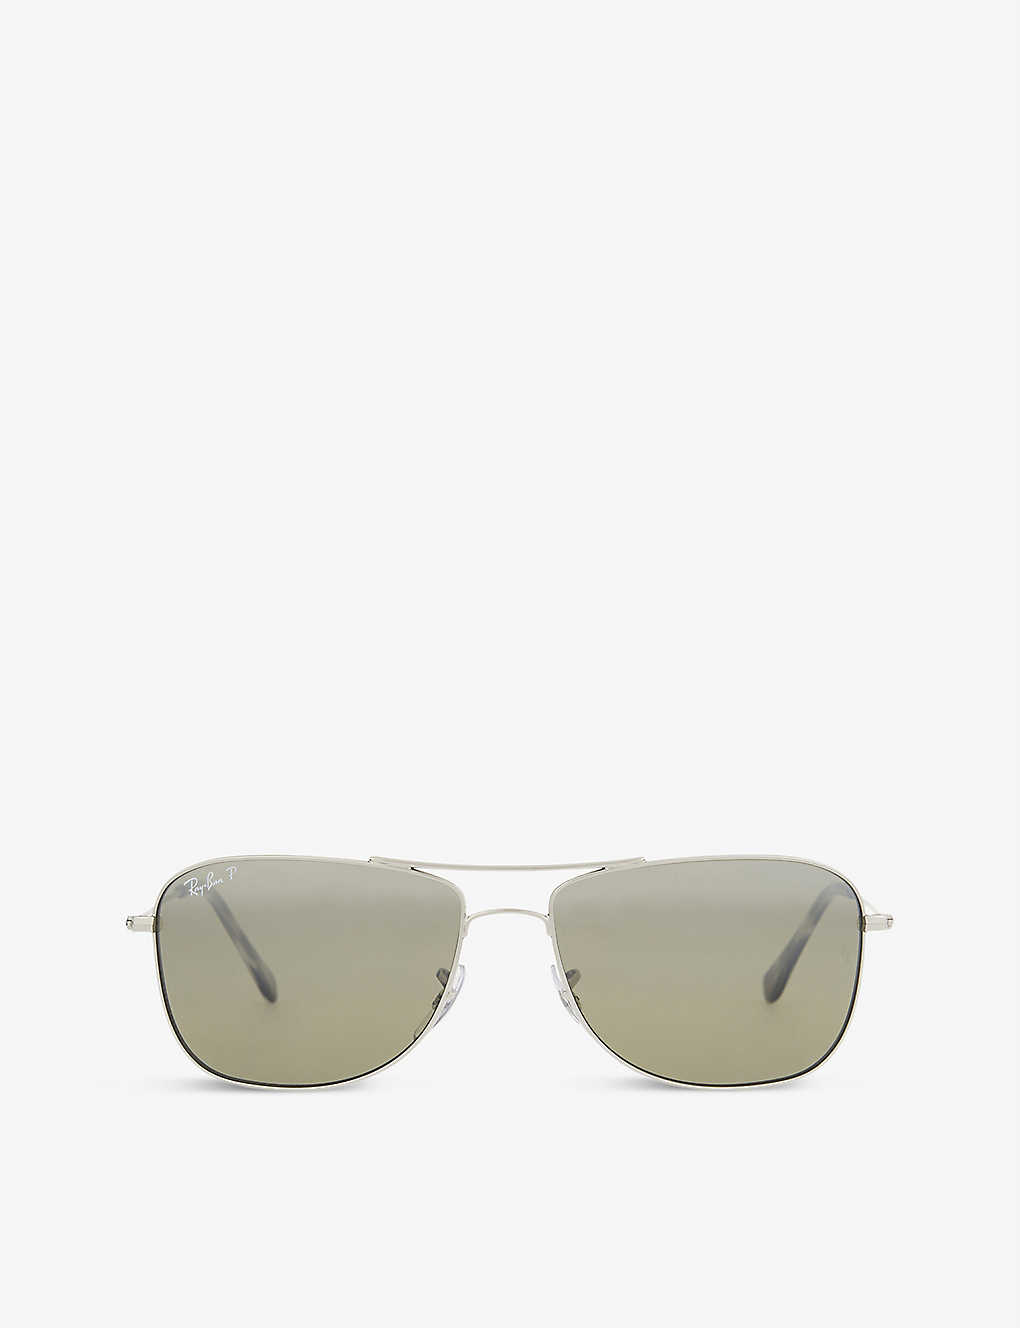 c751db0e90 RAY-BAN - Rb3542 chromance rectangle-frame sunglasses